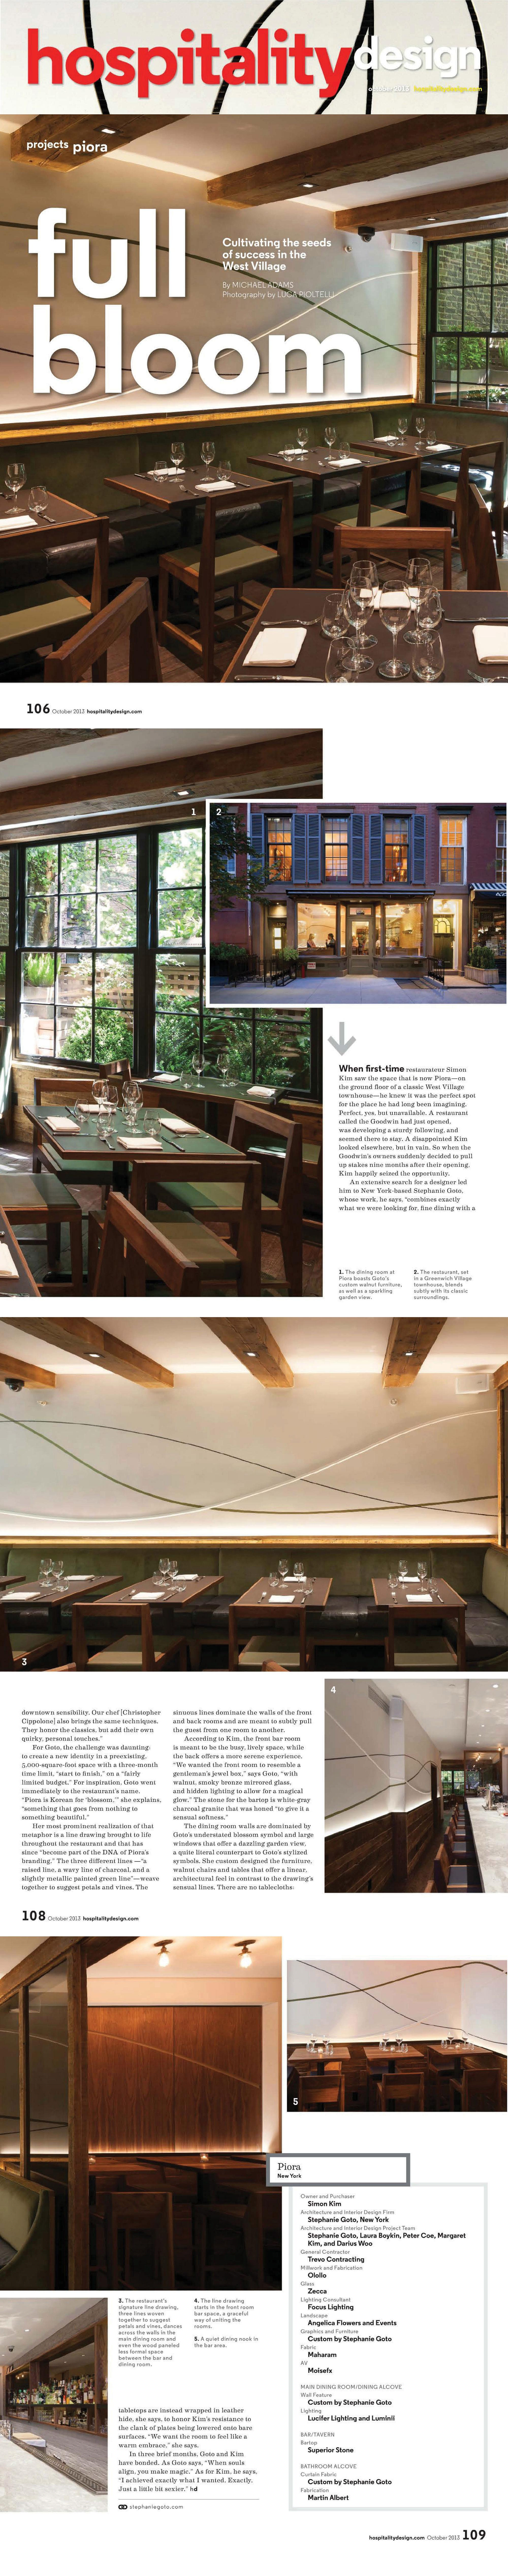 14-2013-10-PIORA-Hospitality-Design.jpg